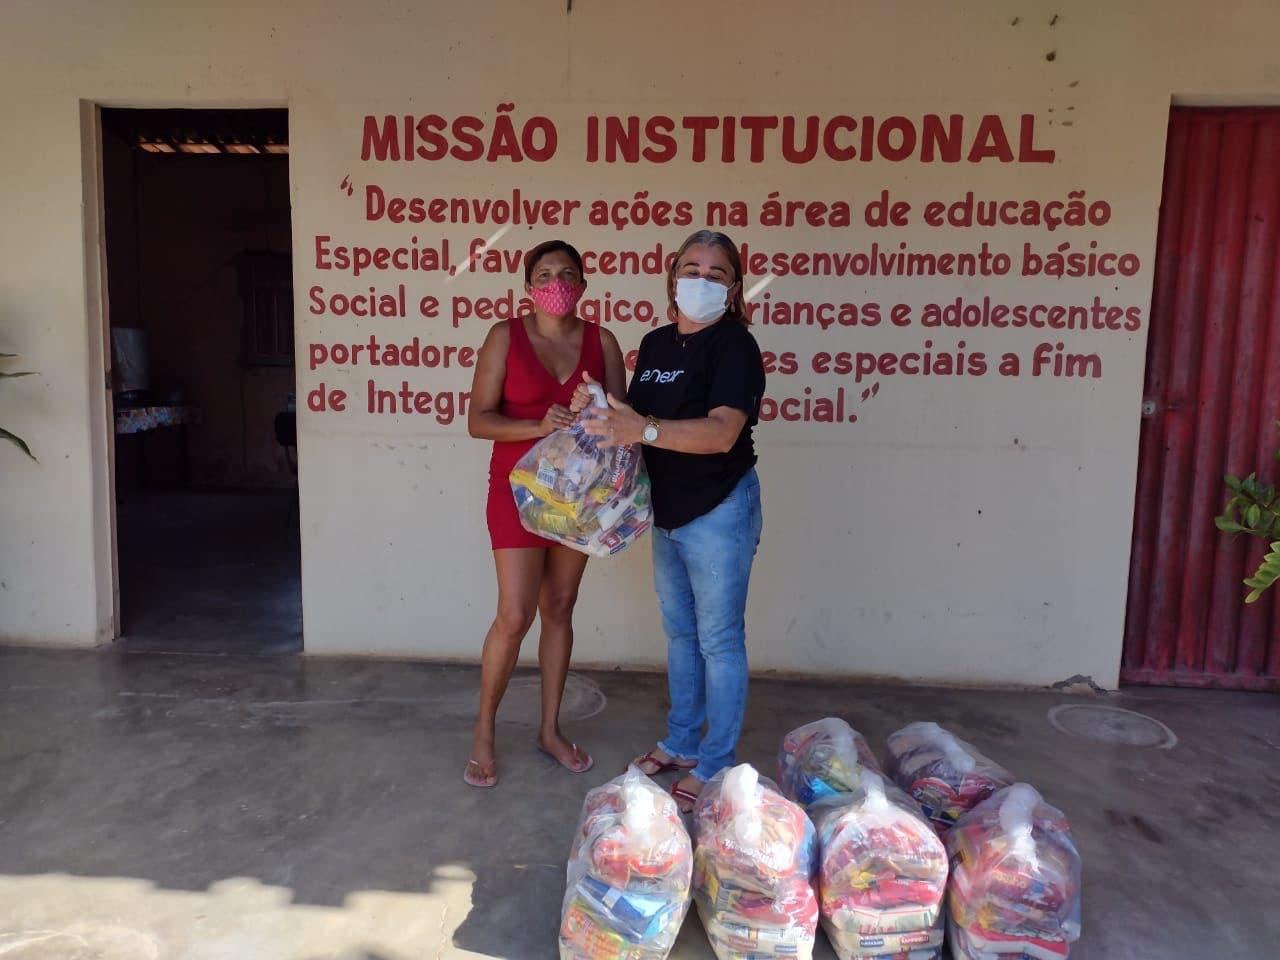 e.near - food baskets offer - Pestalozzi Association Milagres (3)